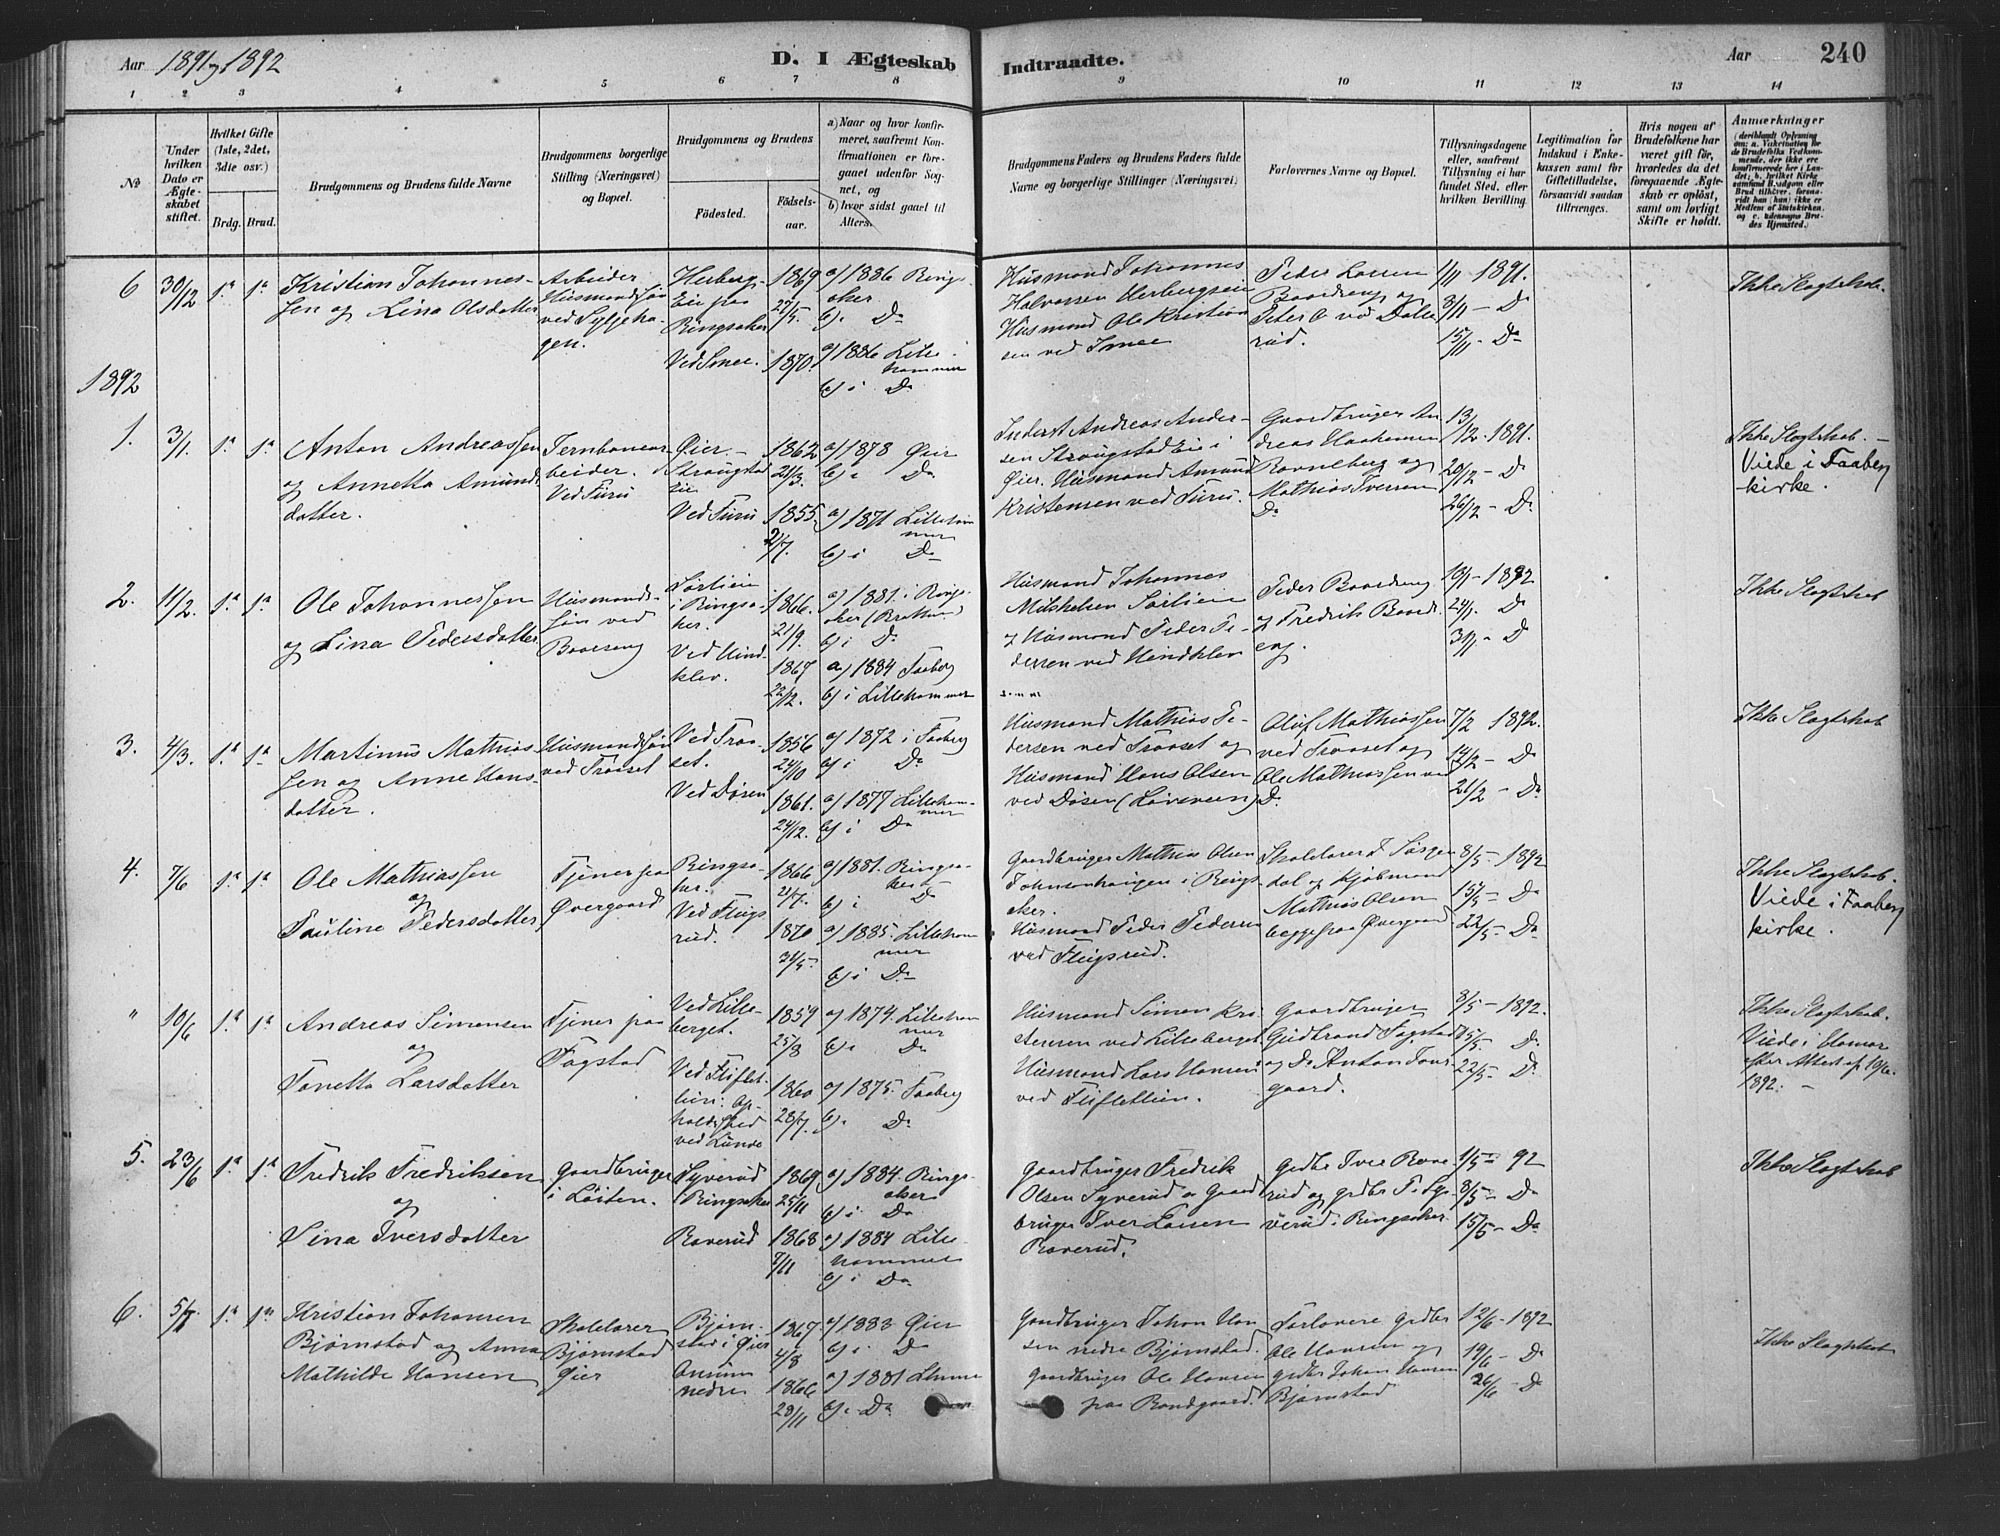 SAH, Fåberg prestekontor, Ministerialbok nr. 9, 1879-1898, s. 240